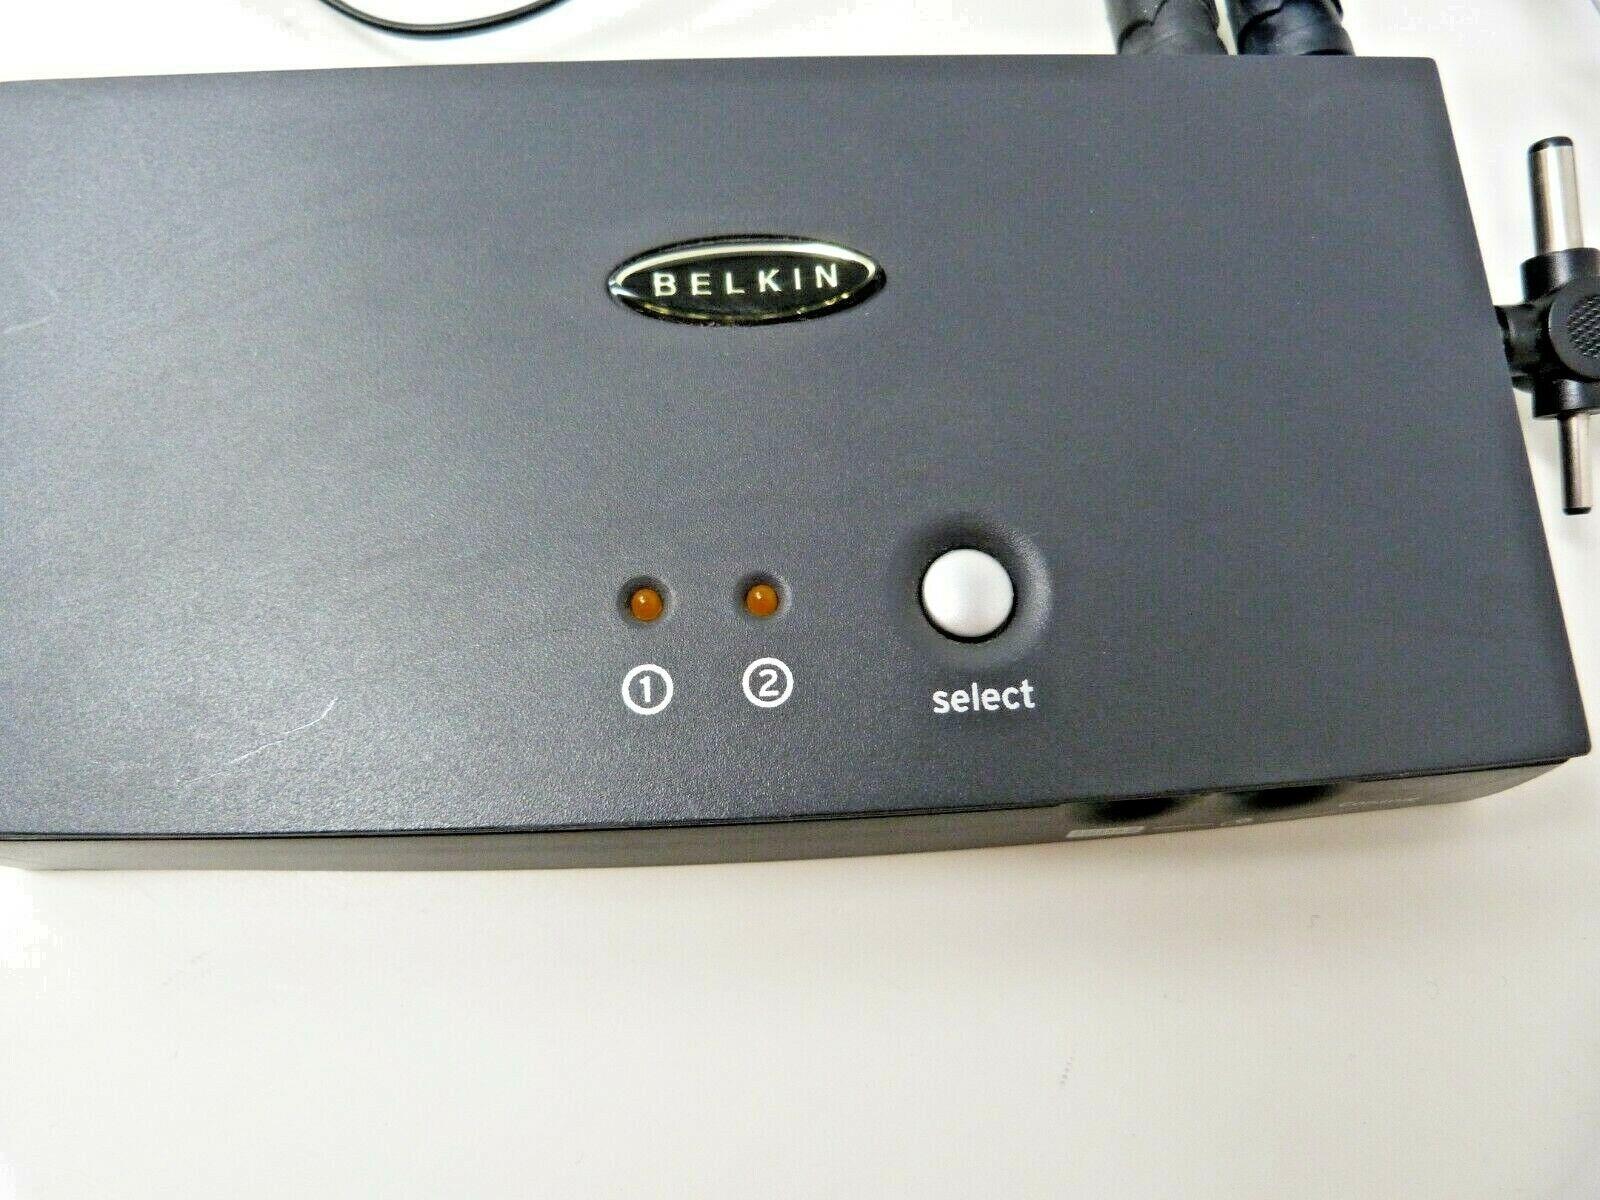 Belkin F1DB102P OmniView E Series 2-Port KVM Switch with leads